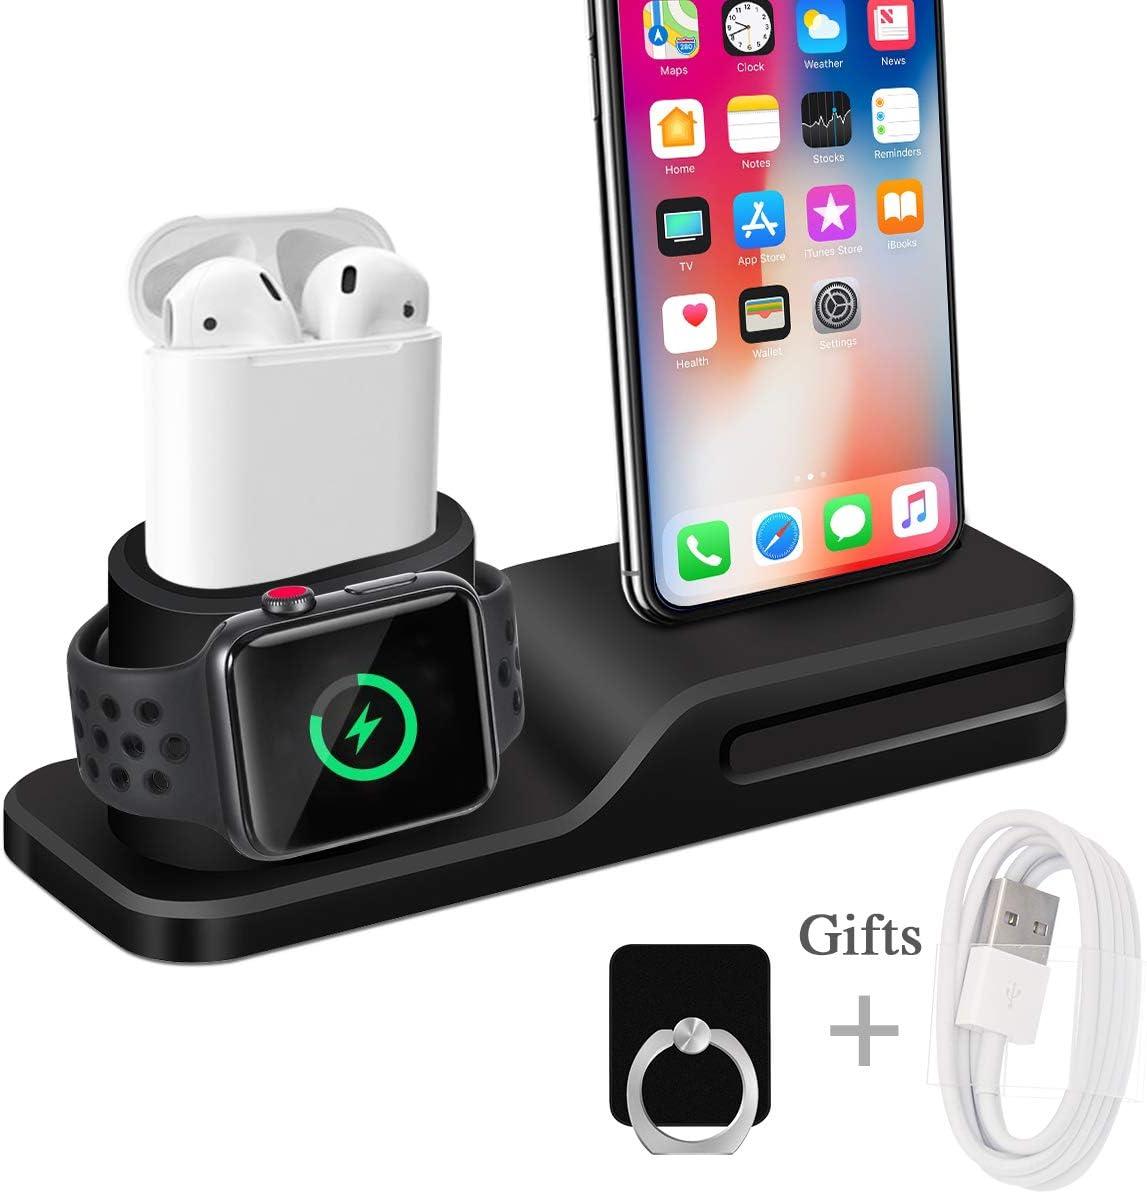 Wonsidary Soporte de Carga para Apple, 3 en 1 Estación de Carga Silicona Base de Carga Soporte Cargador para Apple Watch Series 5/4/3/2/1, Airpods, iPhone 11/11Pro/Xs/Xs MAX/Xr/X/8/7 Plus/6